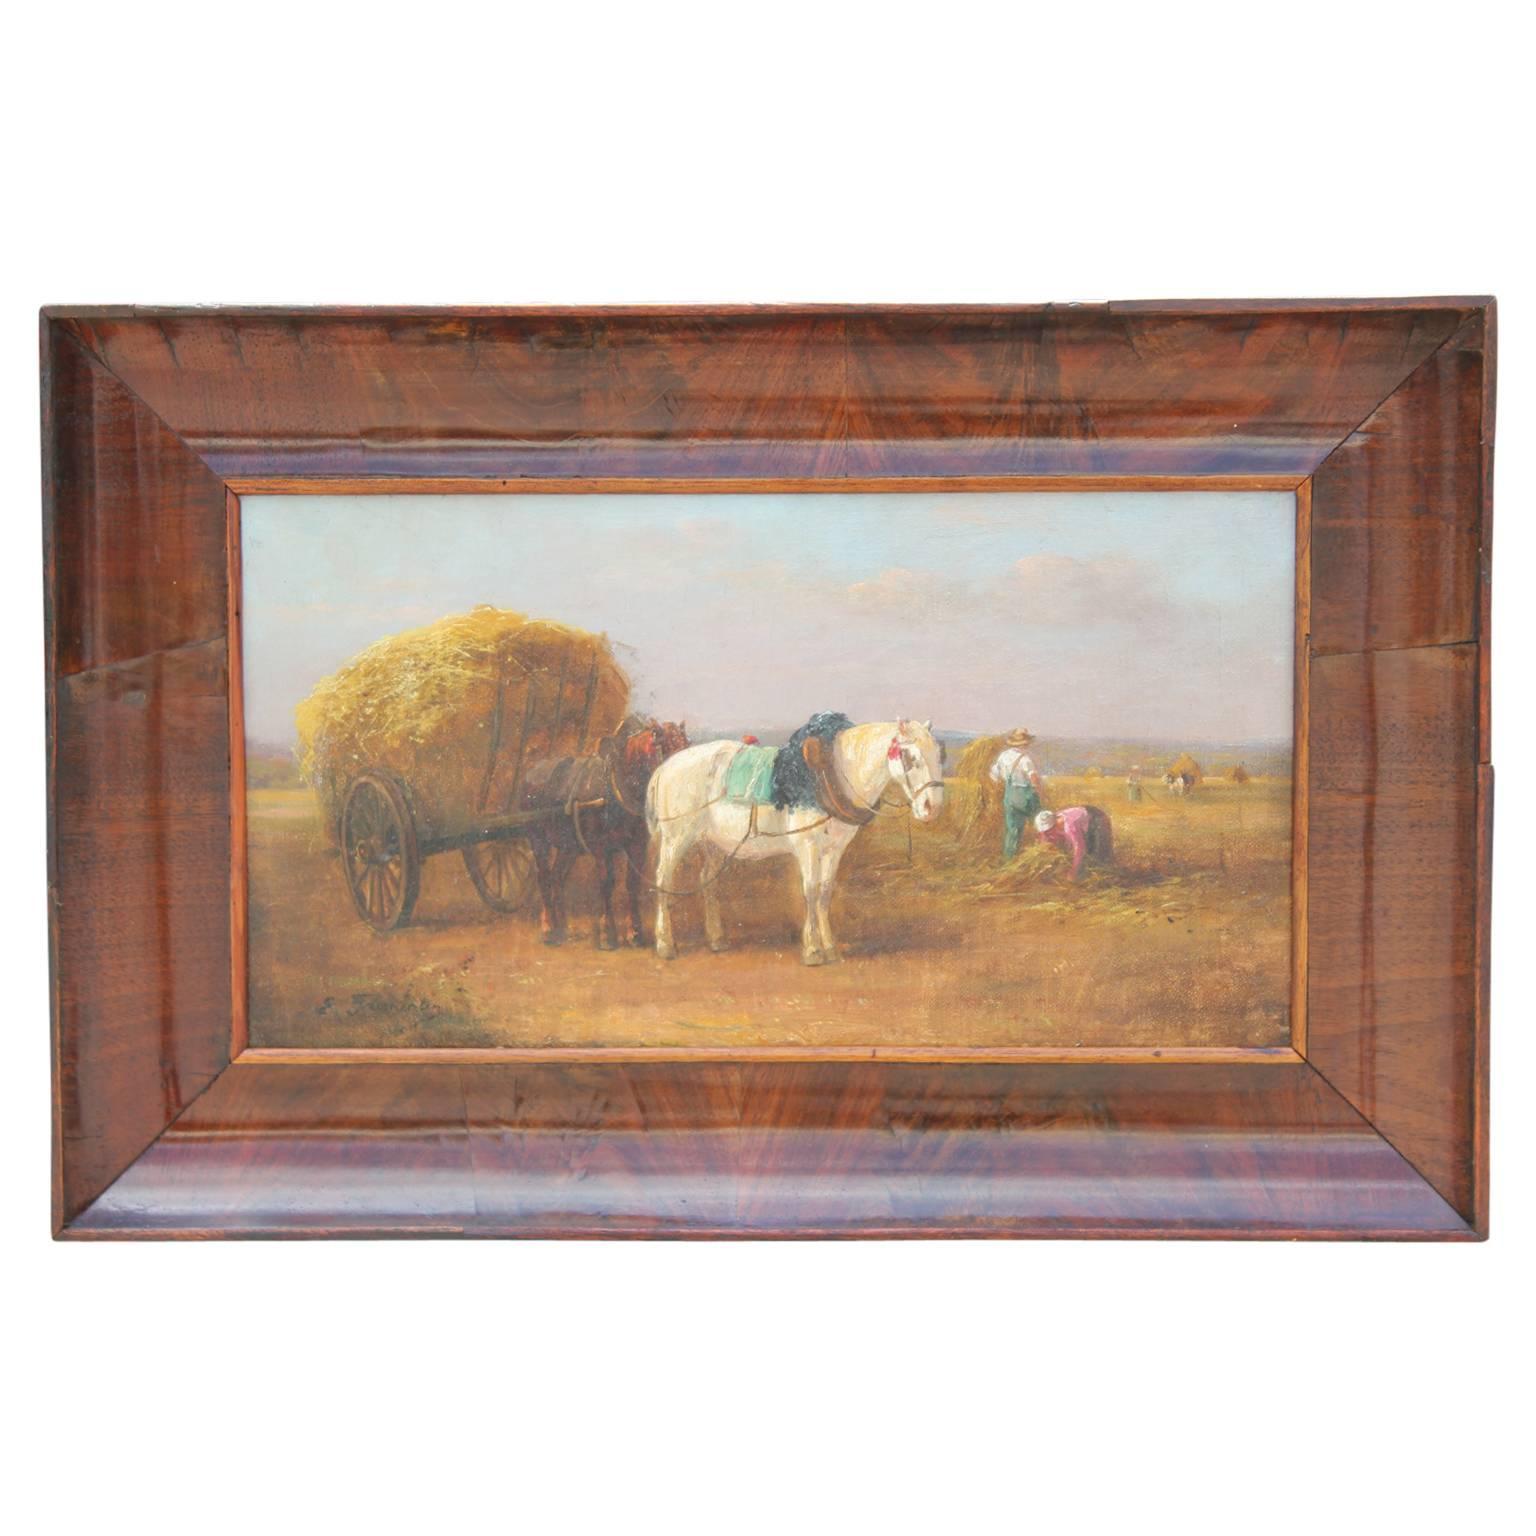 Hay Farm Scene with Landscape